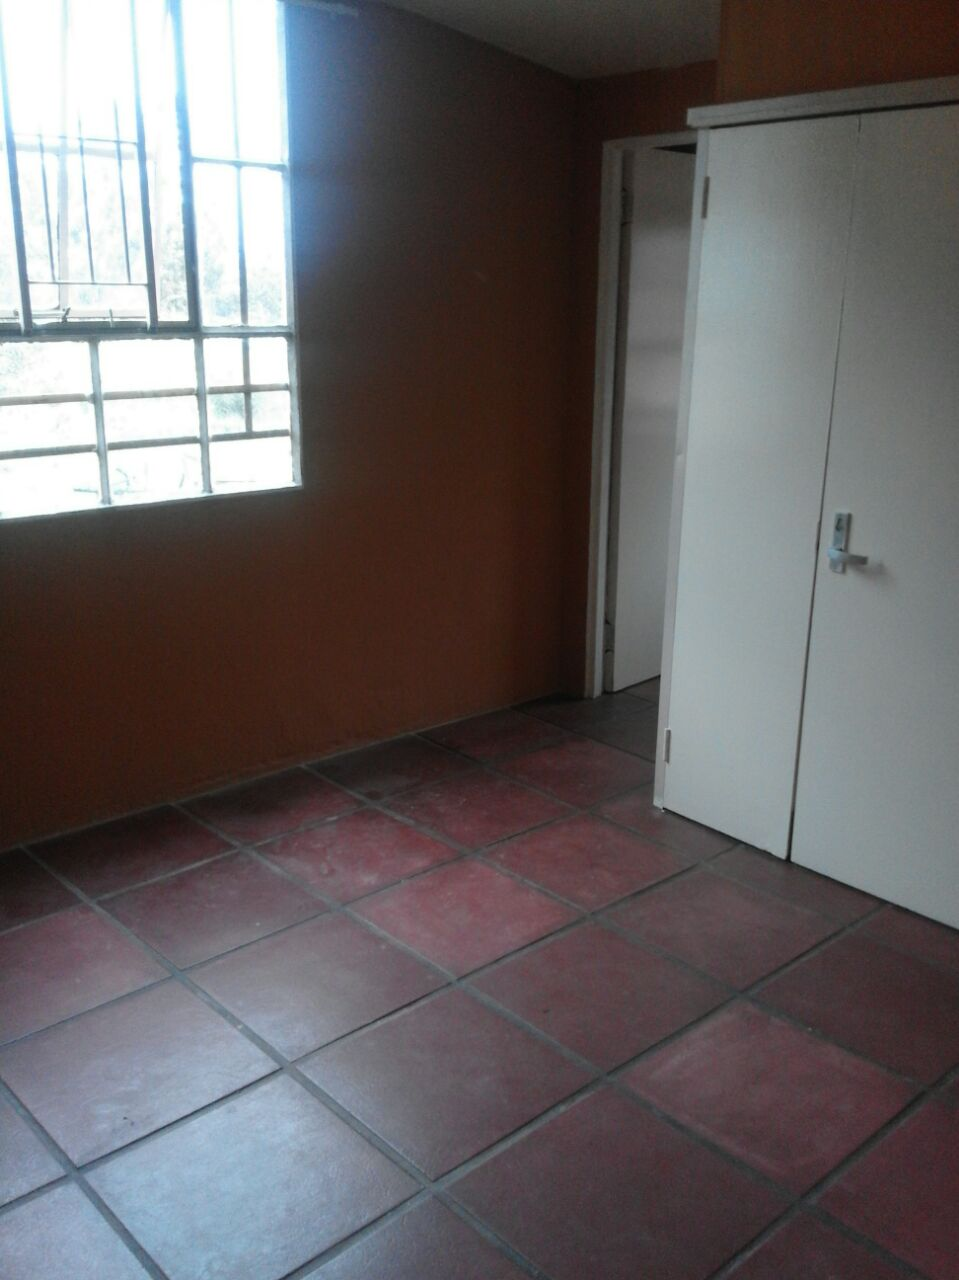 Randfontein Hillside 2 slaapkamer woonstel te huur +/-12km uit Randfontein